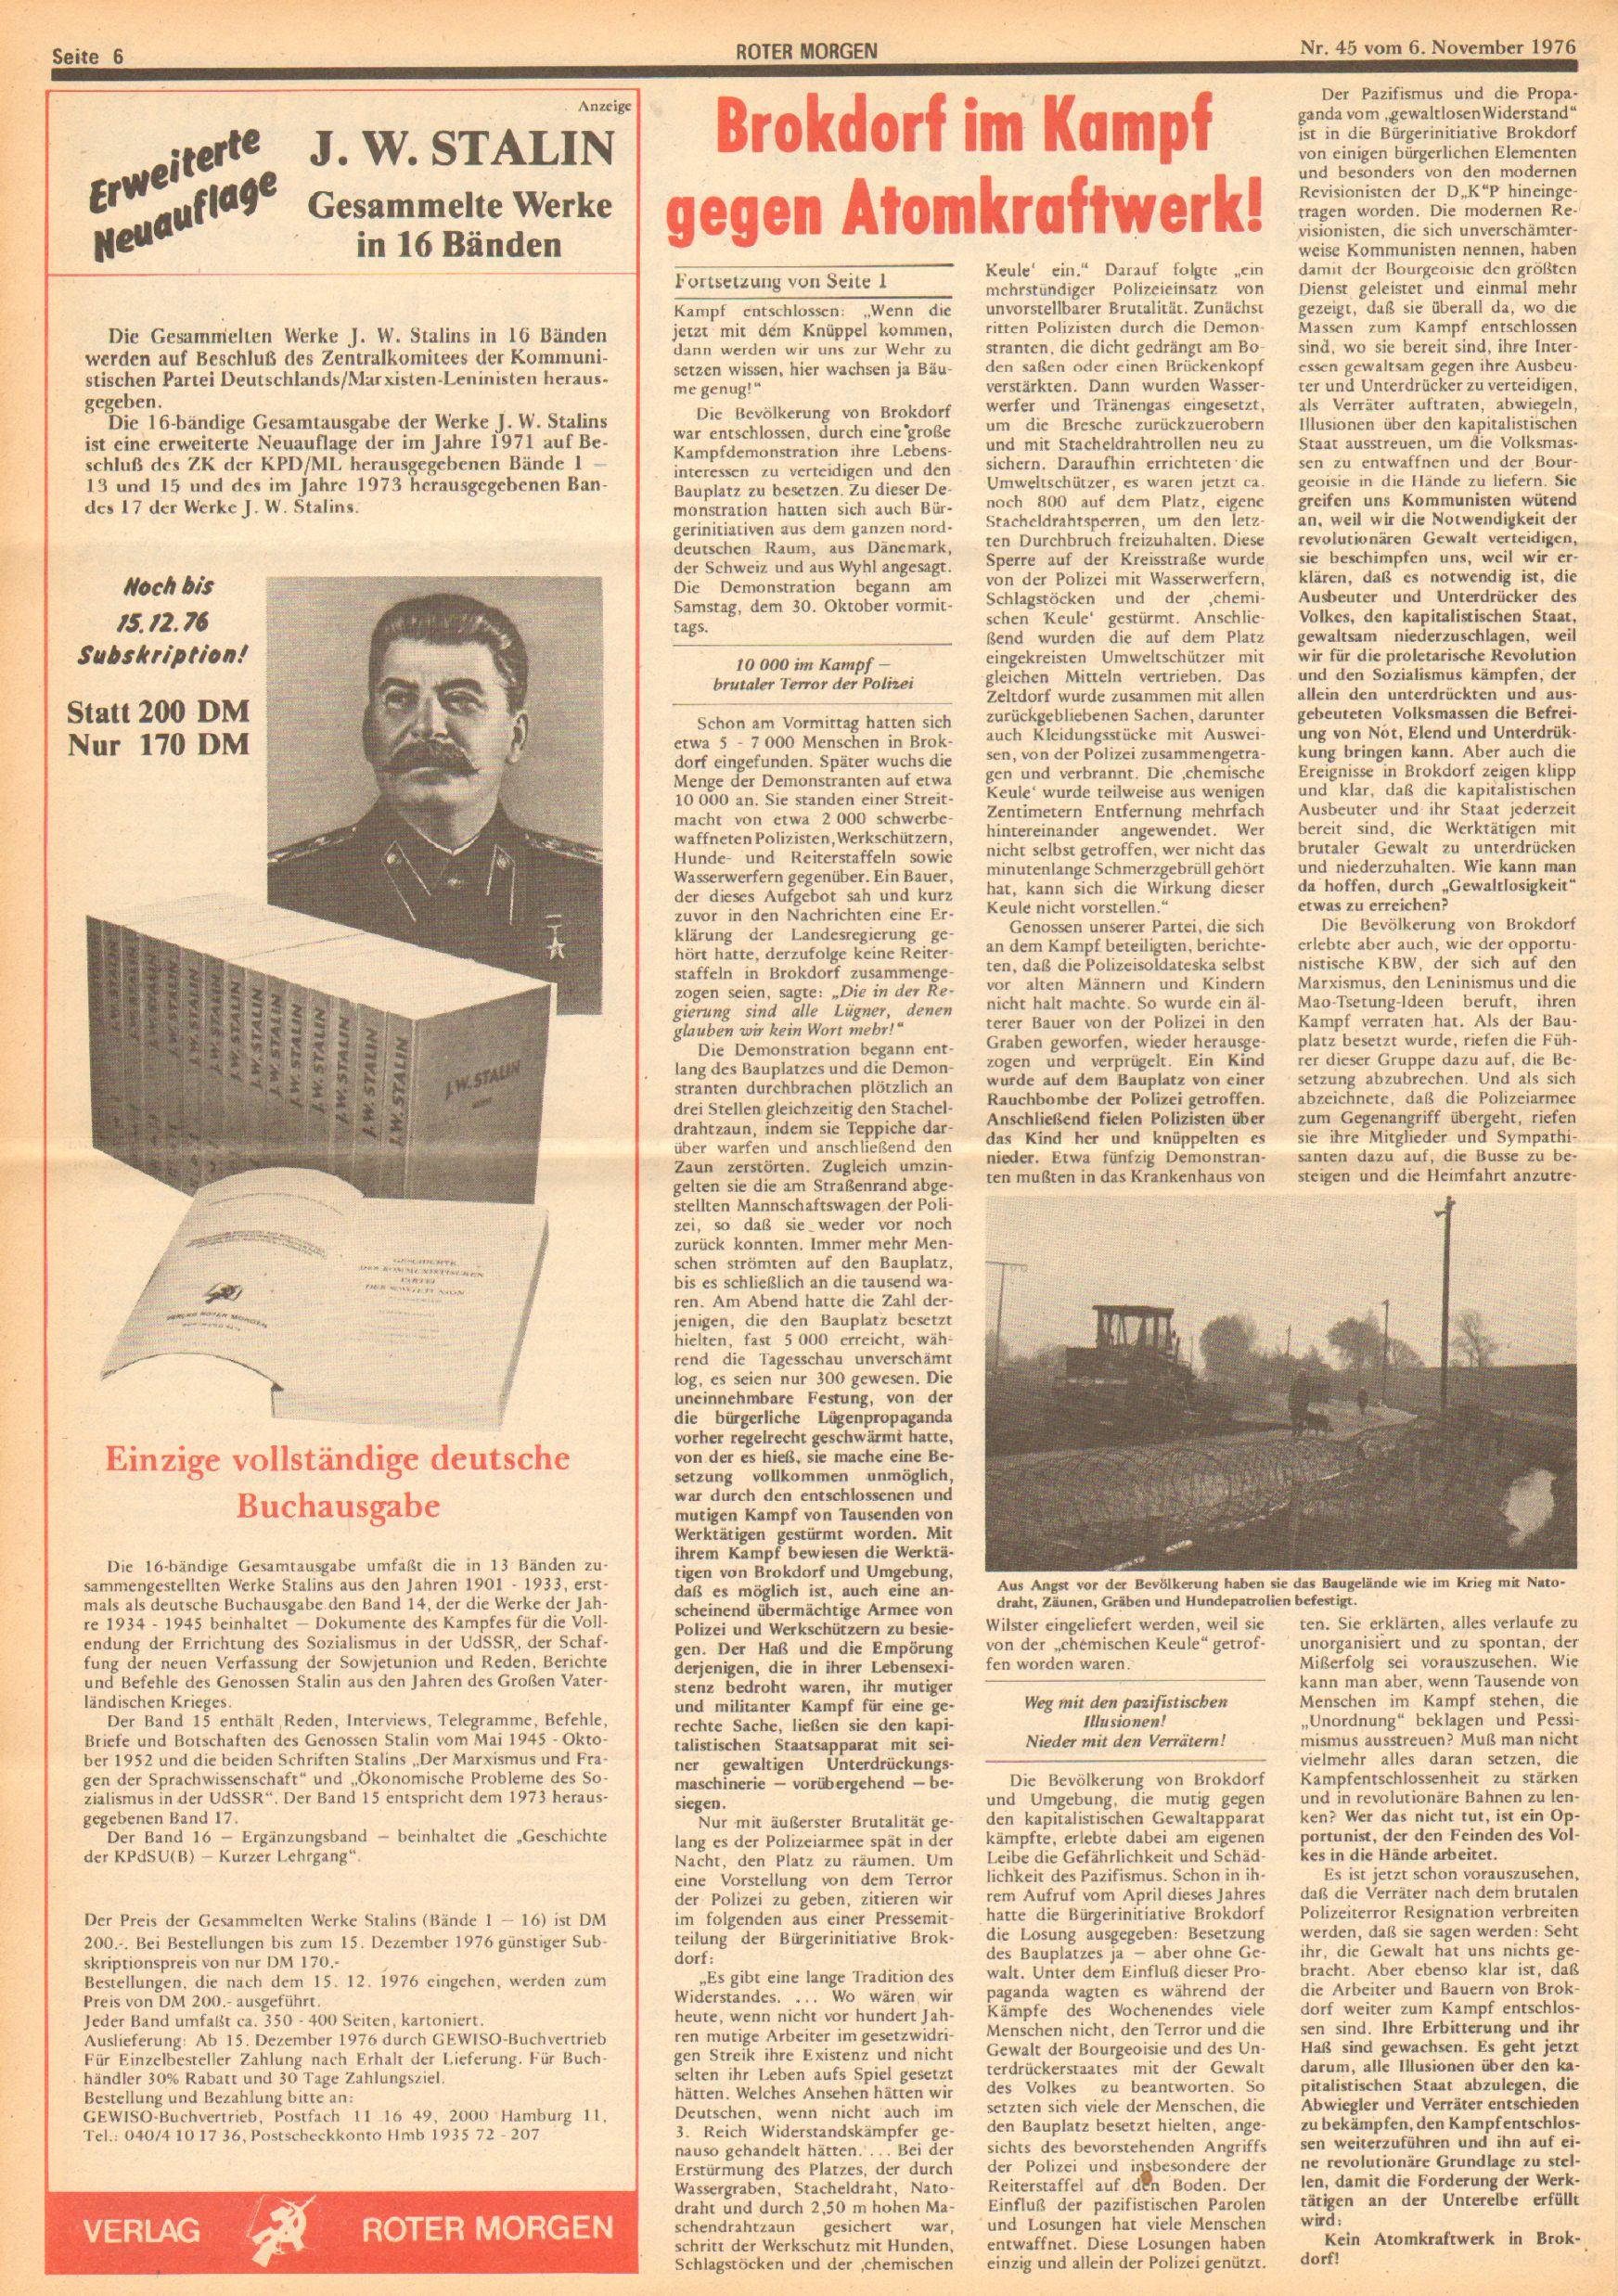 Roter Morgen, 10. Jg., 6. November 1976, Nr. 45, Seite 6